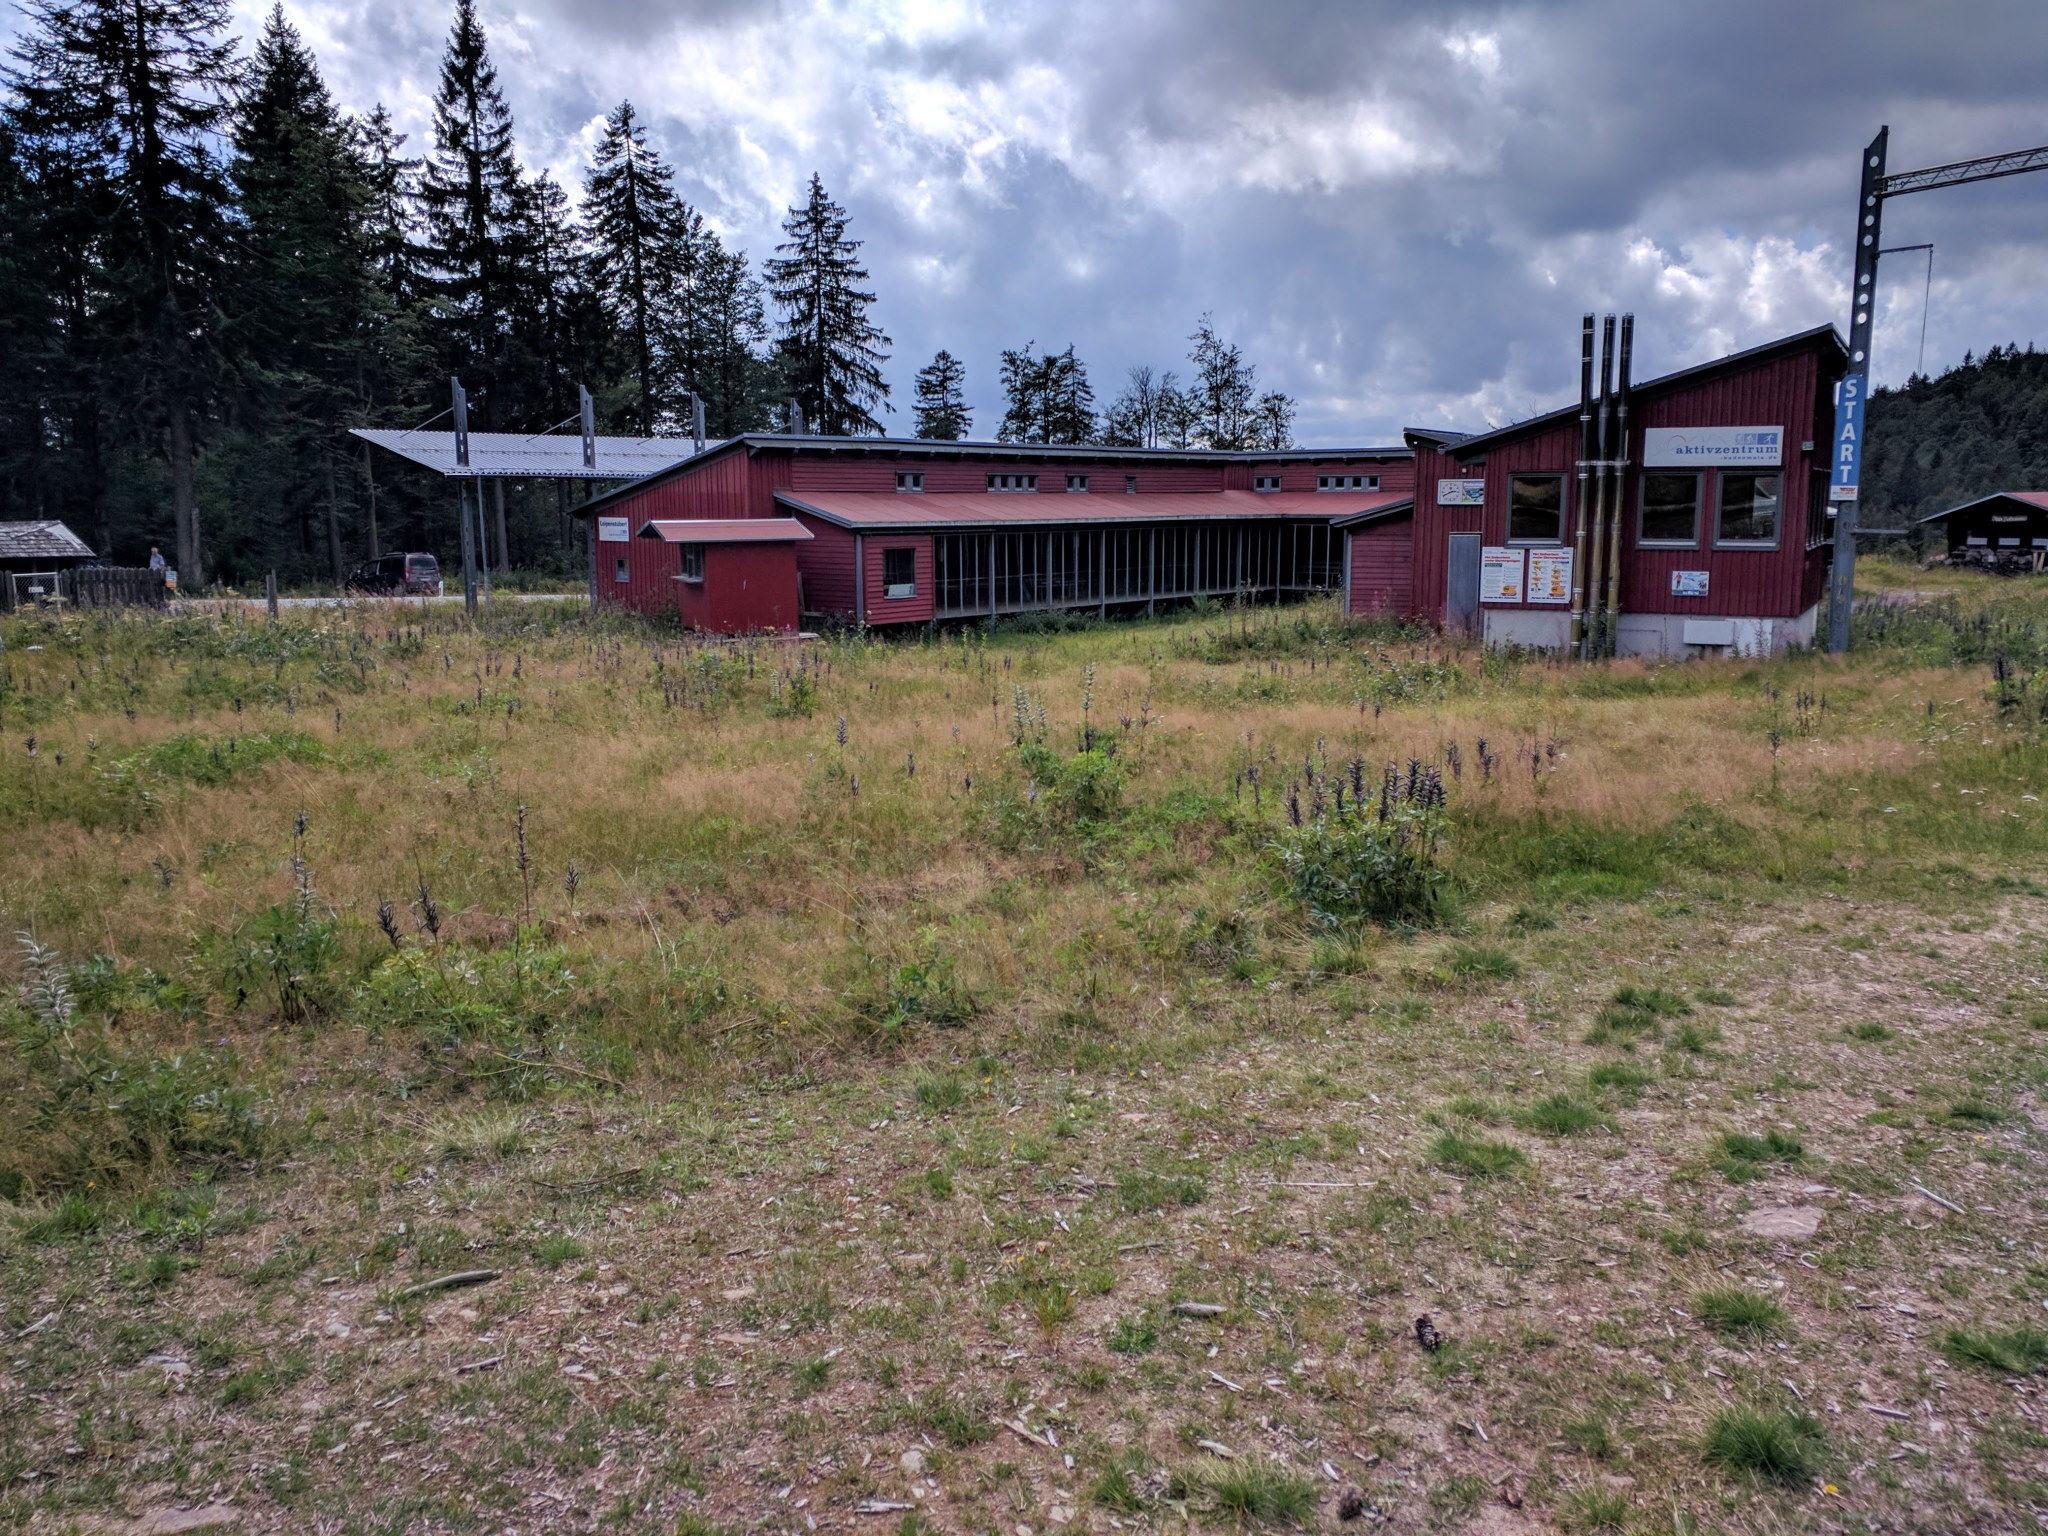 Langlaufzentrum in Bretterschachten